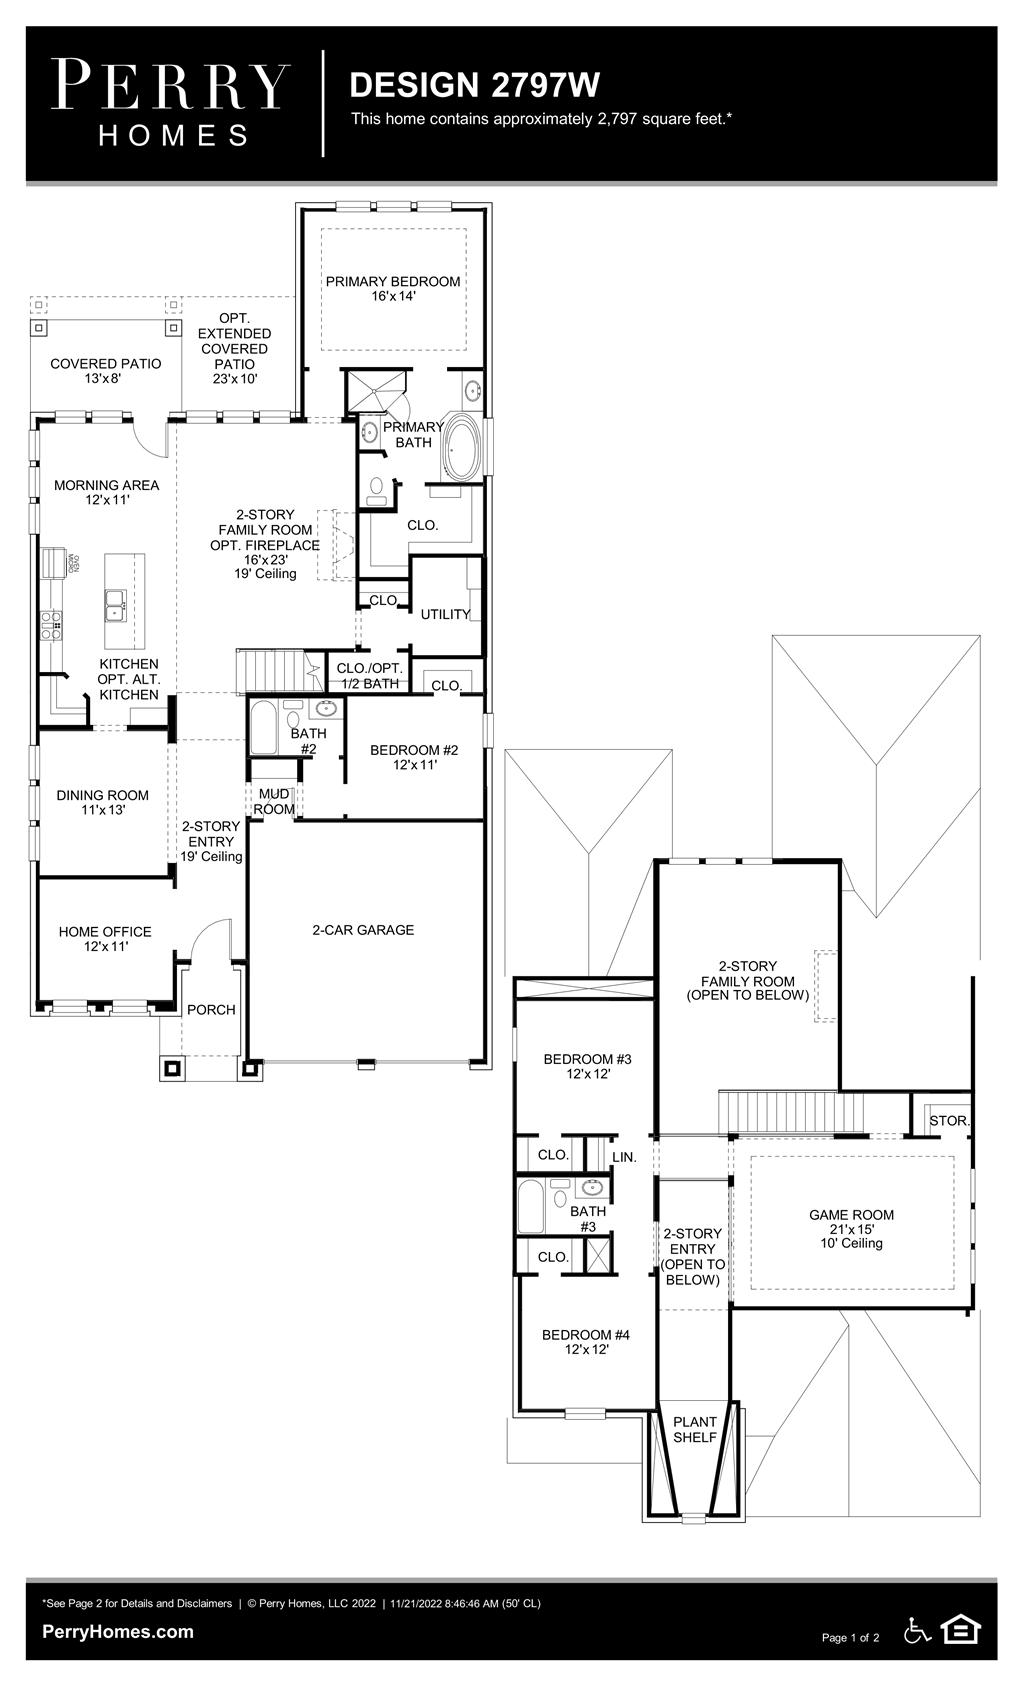 Floor Plan for 2797W